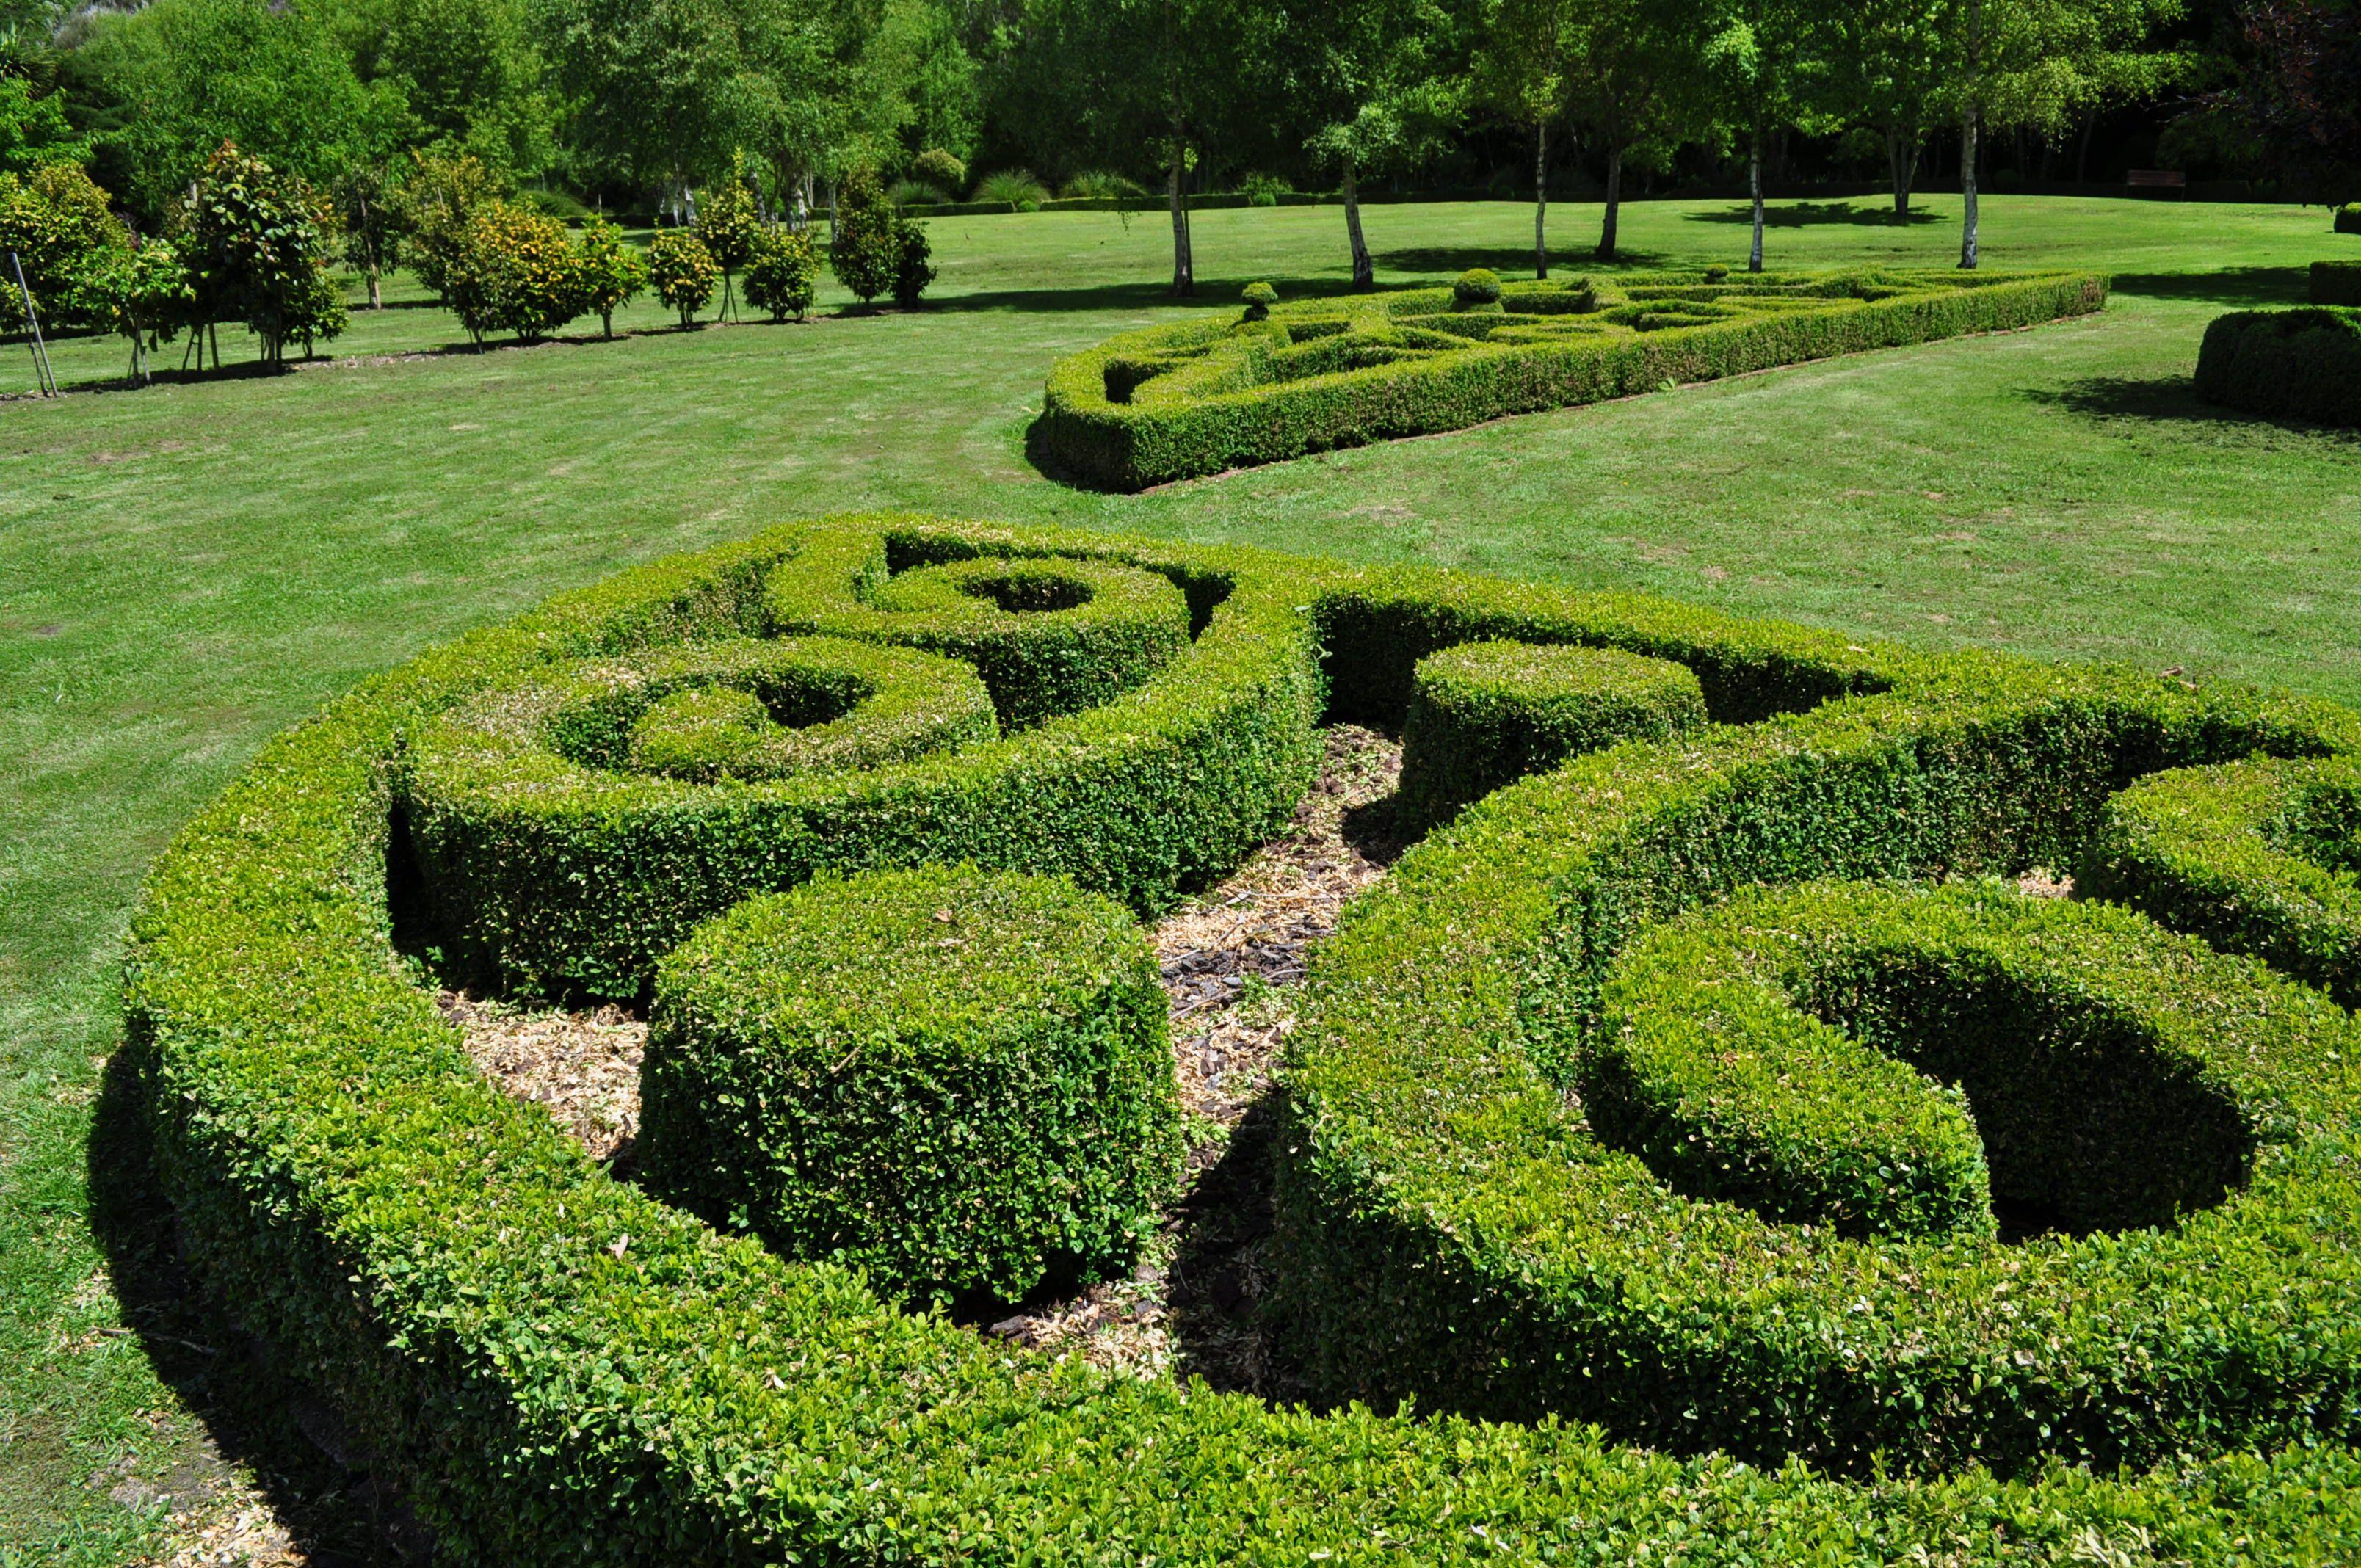 Nz koru form beauty of flowers gardens garden ideas garden nz koru form beauty of flowers gardens izmirmasajfo